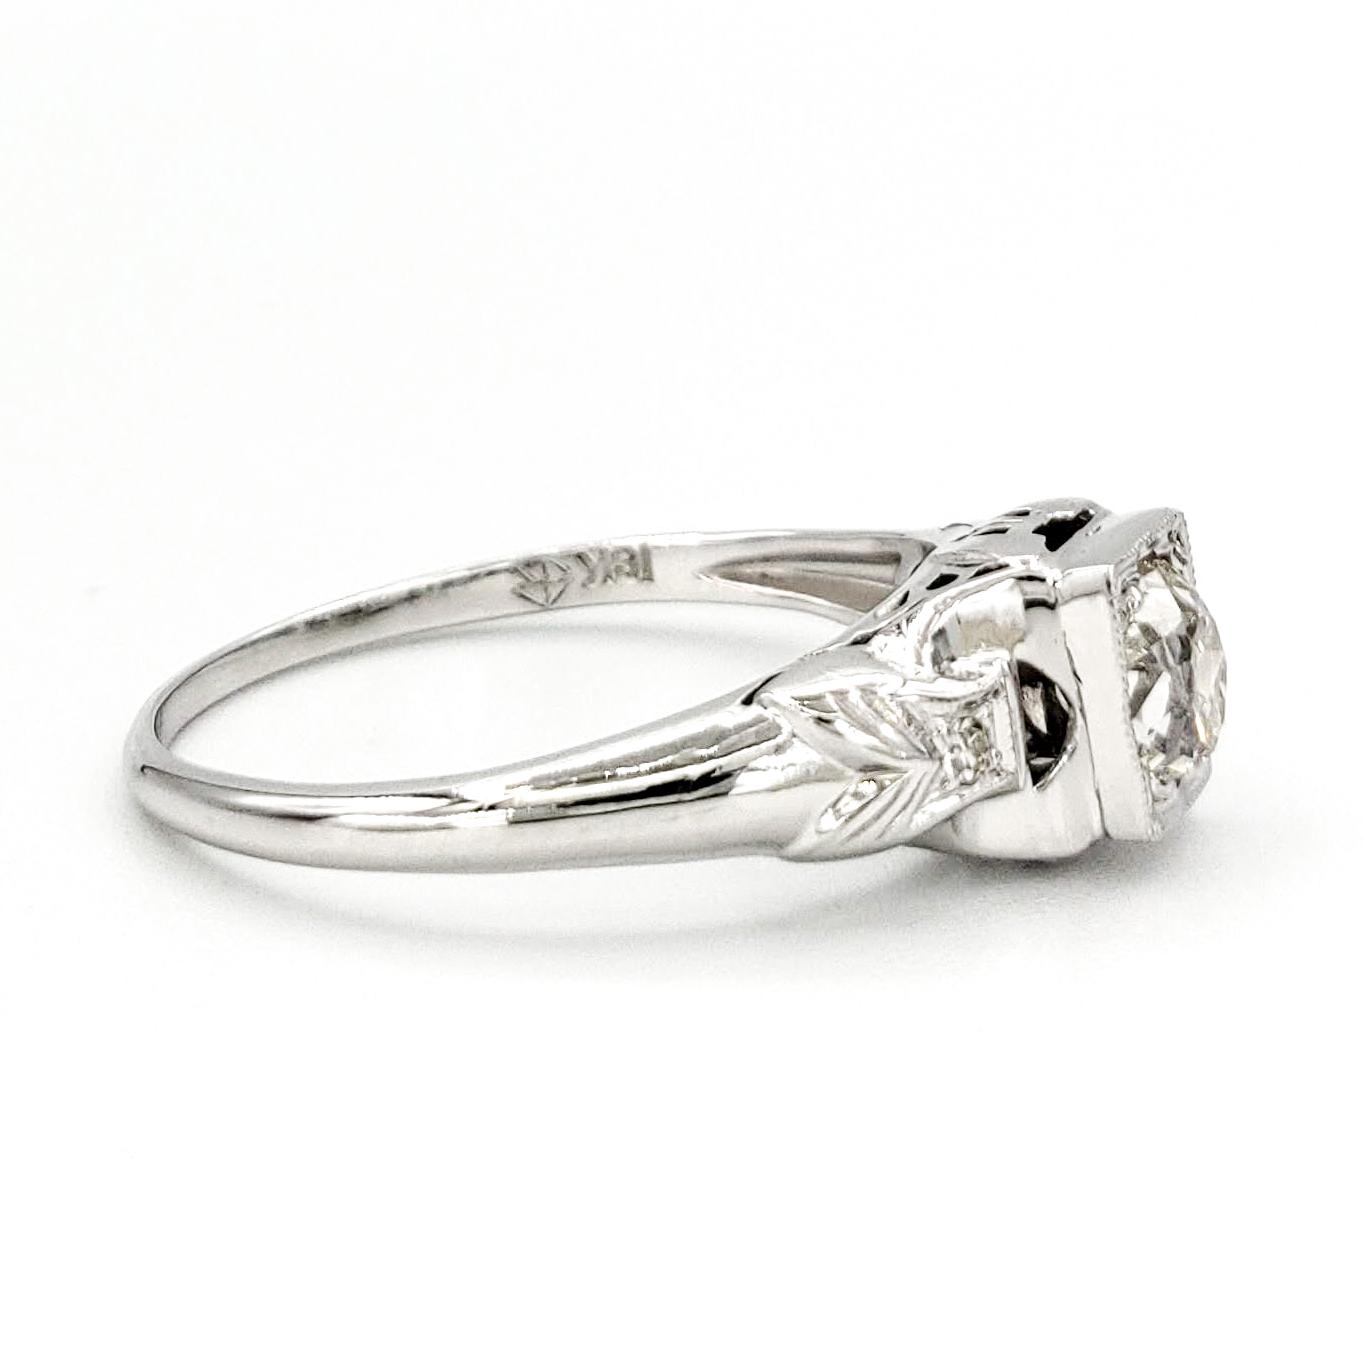 vintage-18-karat-gold-engagement-ring-with-0-51-carat-old-mine-cut-diamond-egl-h-vs2